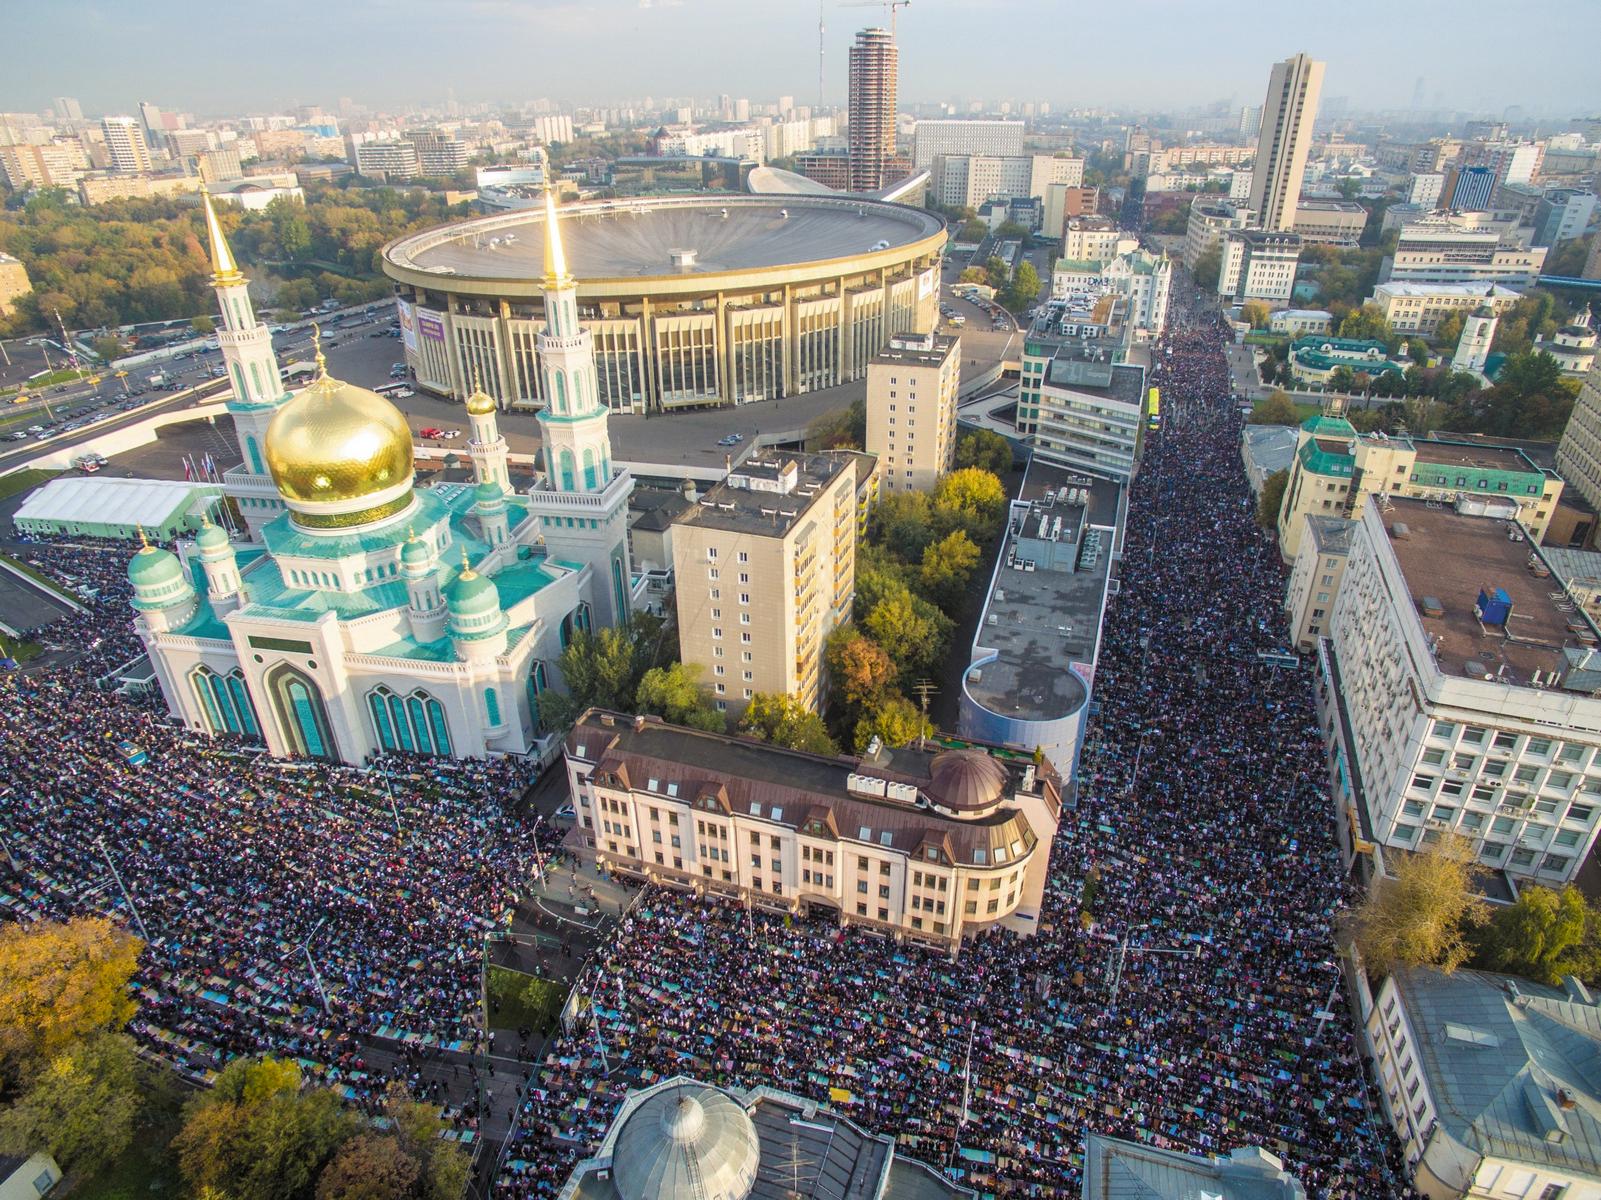 http://www.islamnews.ru/wp-content/uploads/2016/07/a6e5e3.jpg